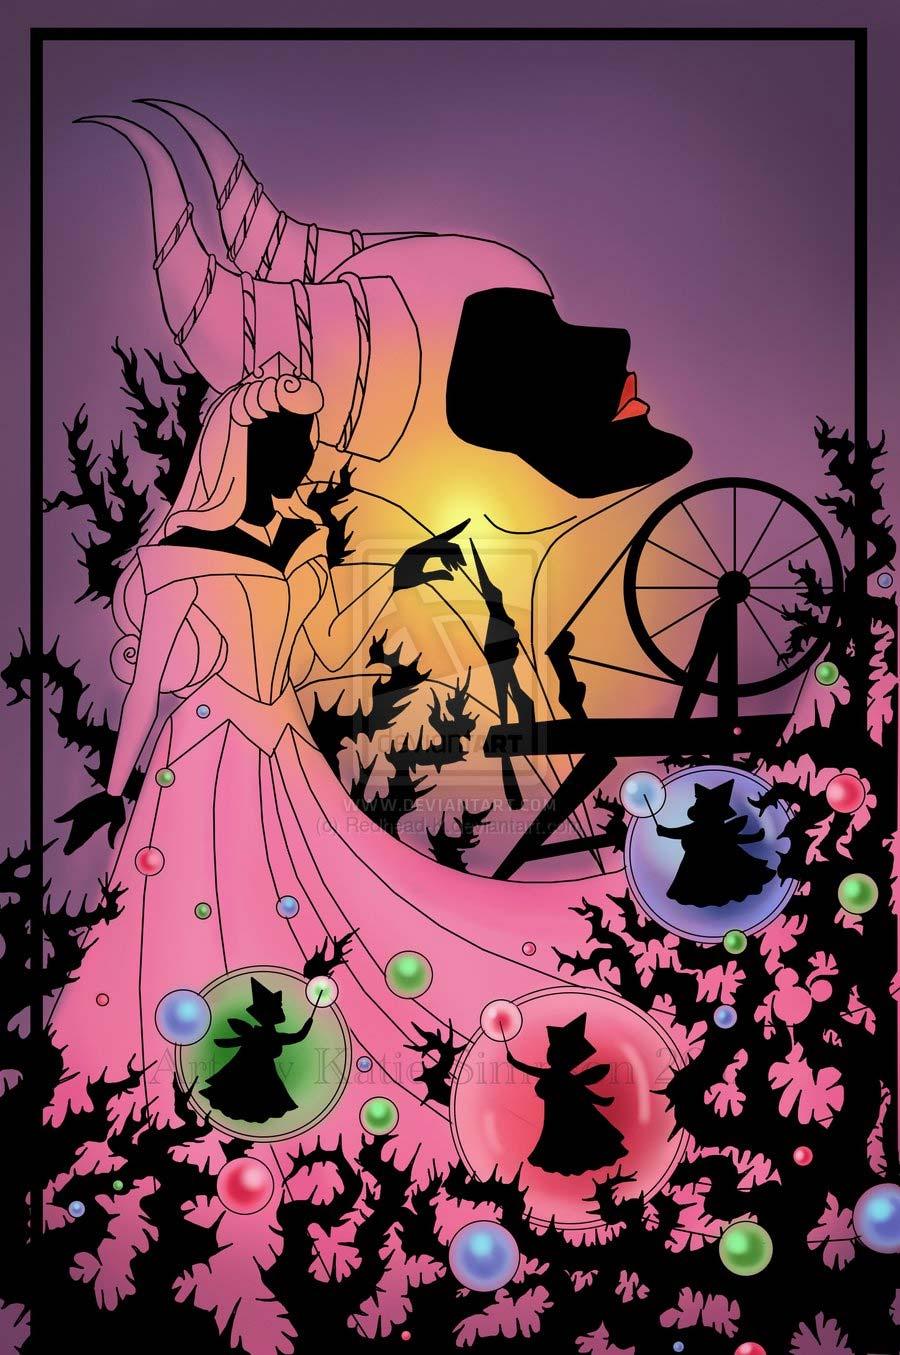 disney-ilustracoes-silhuetas-aurora